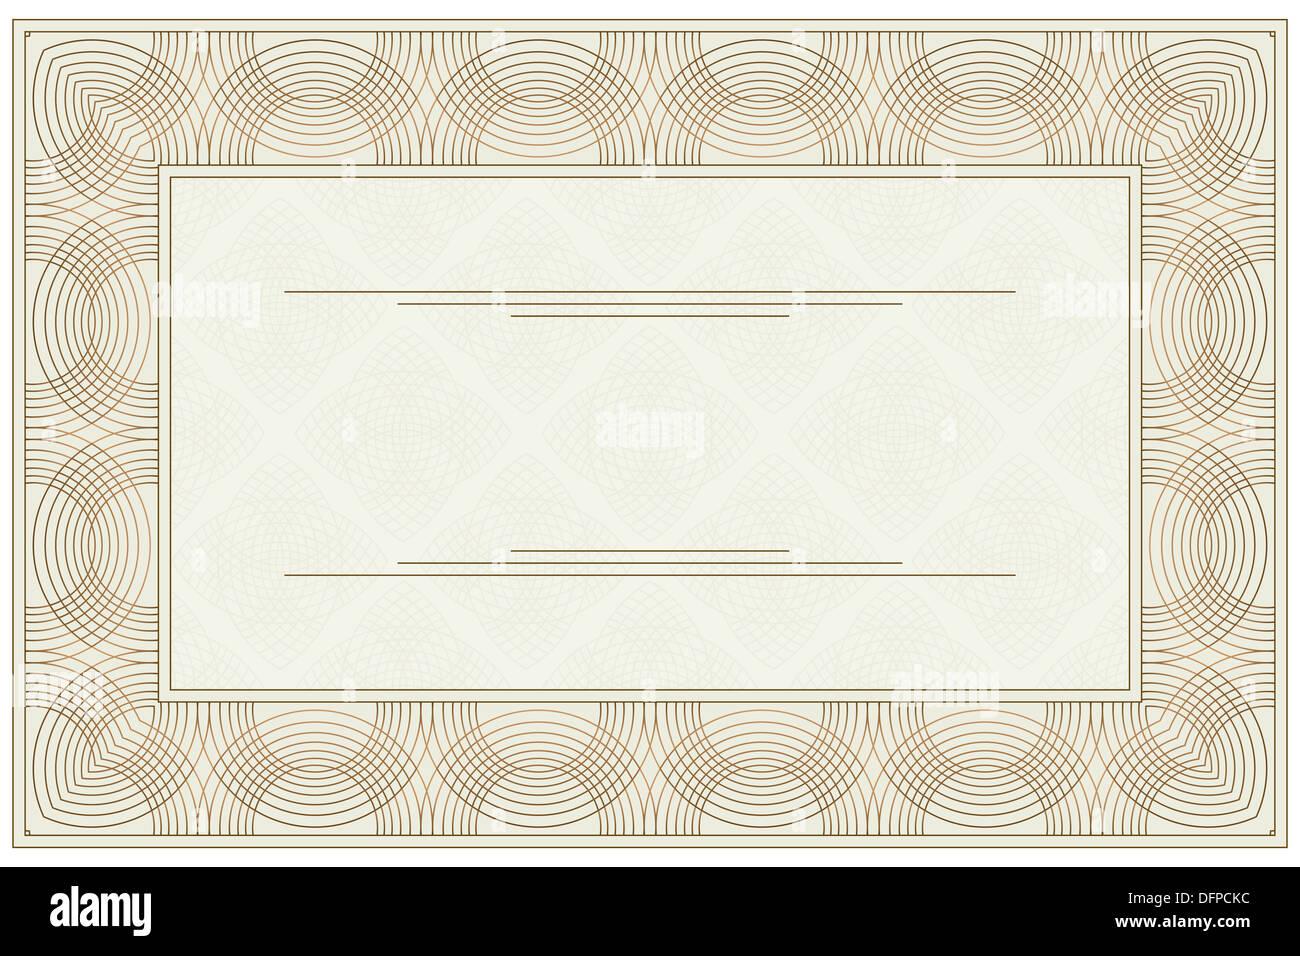 Blank voucher Photo Royalty Free Image 61343840 Alamy – Blank Voucher